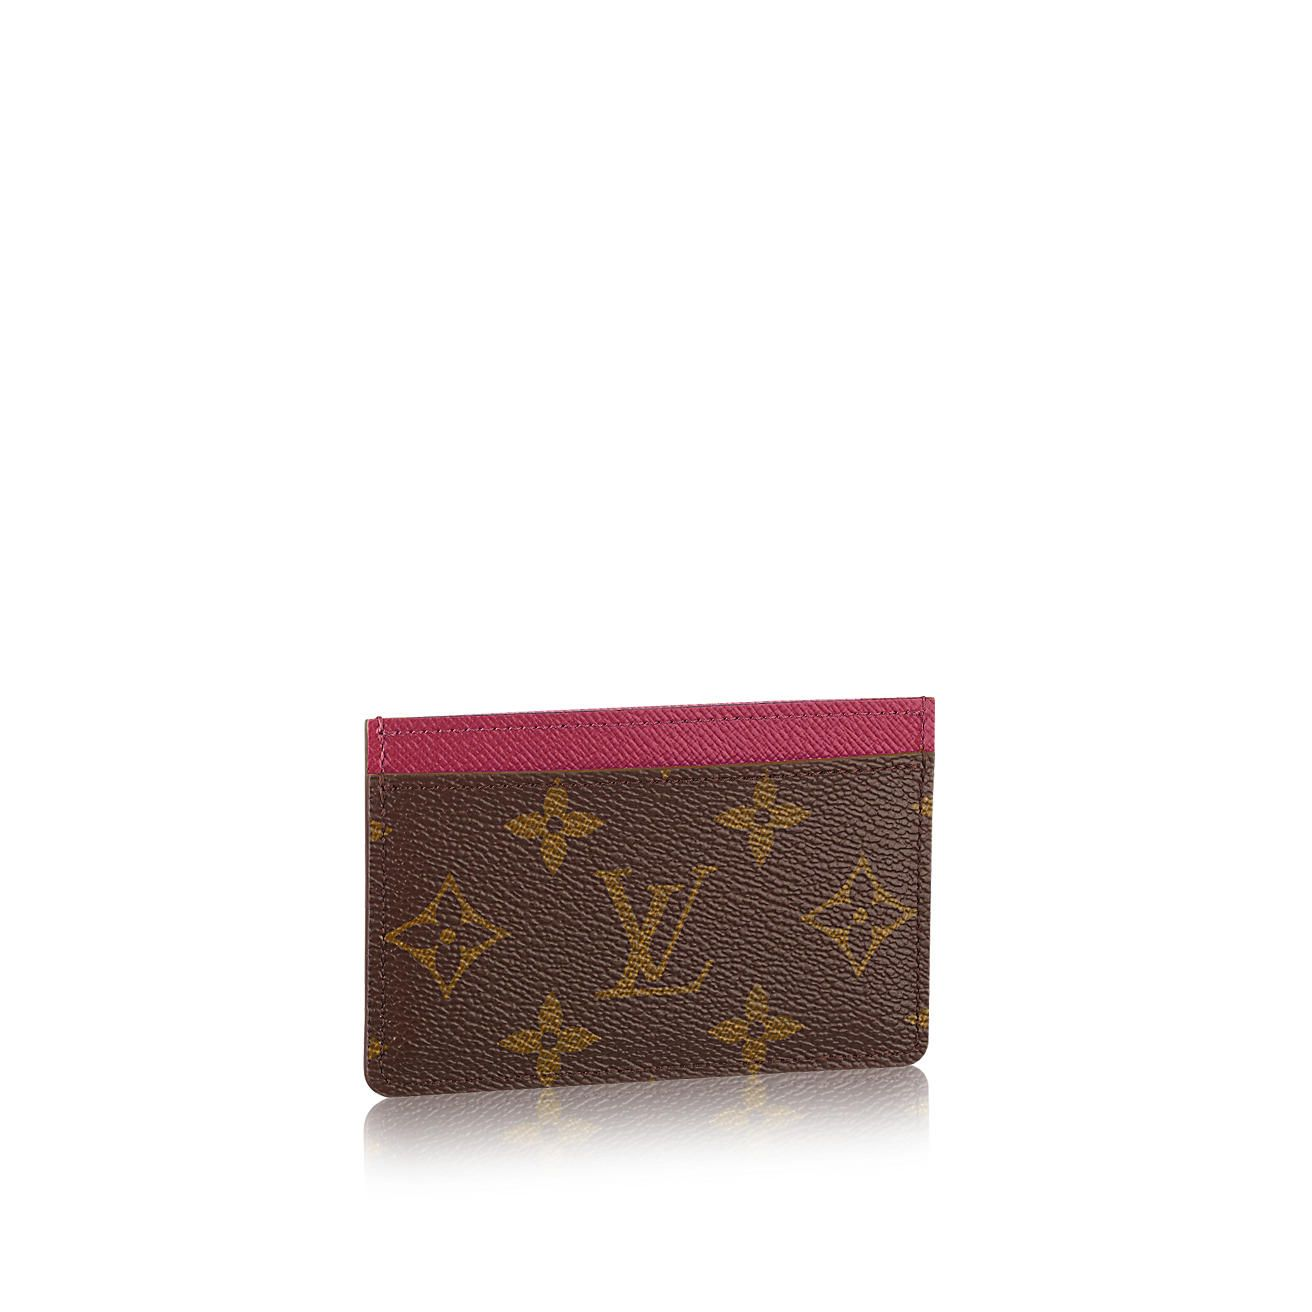 Monogram Canvas, Card Holder, Louis Vuitton